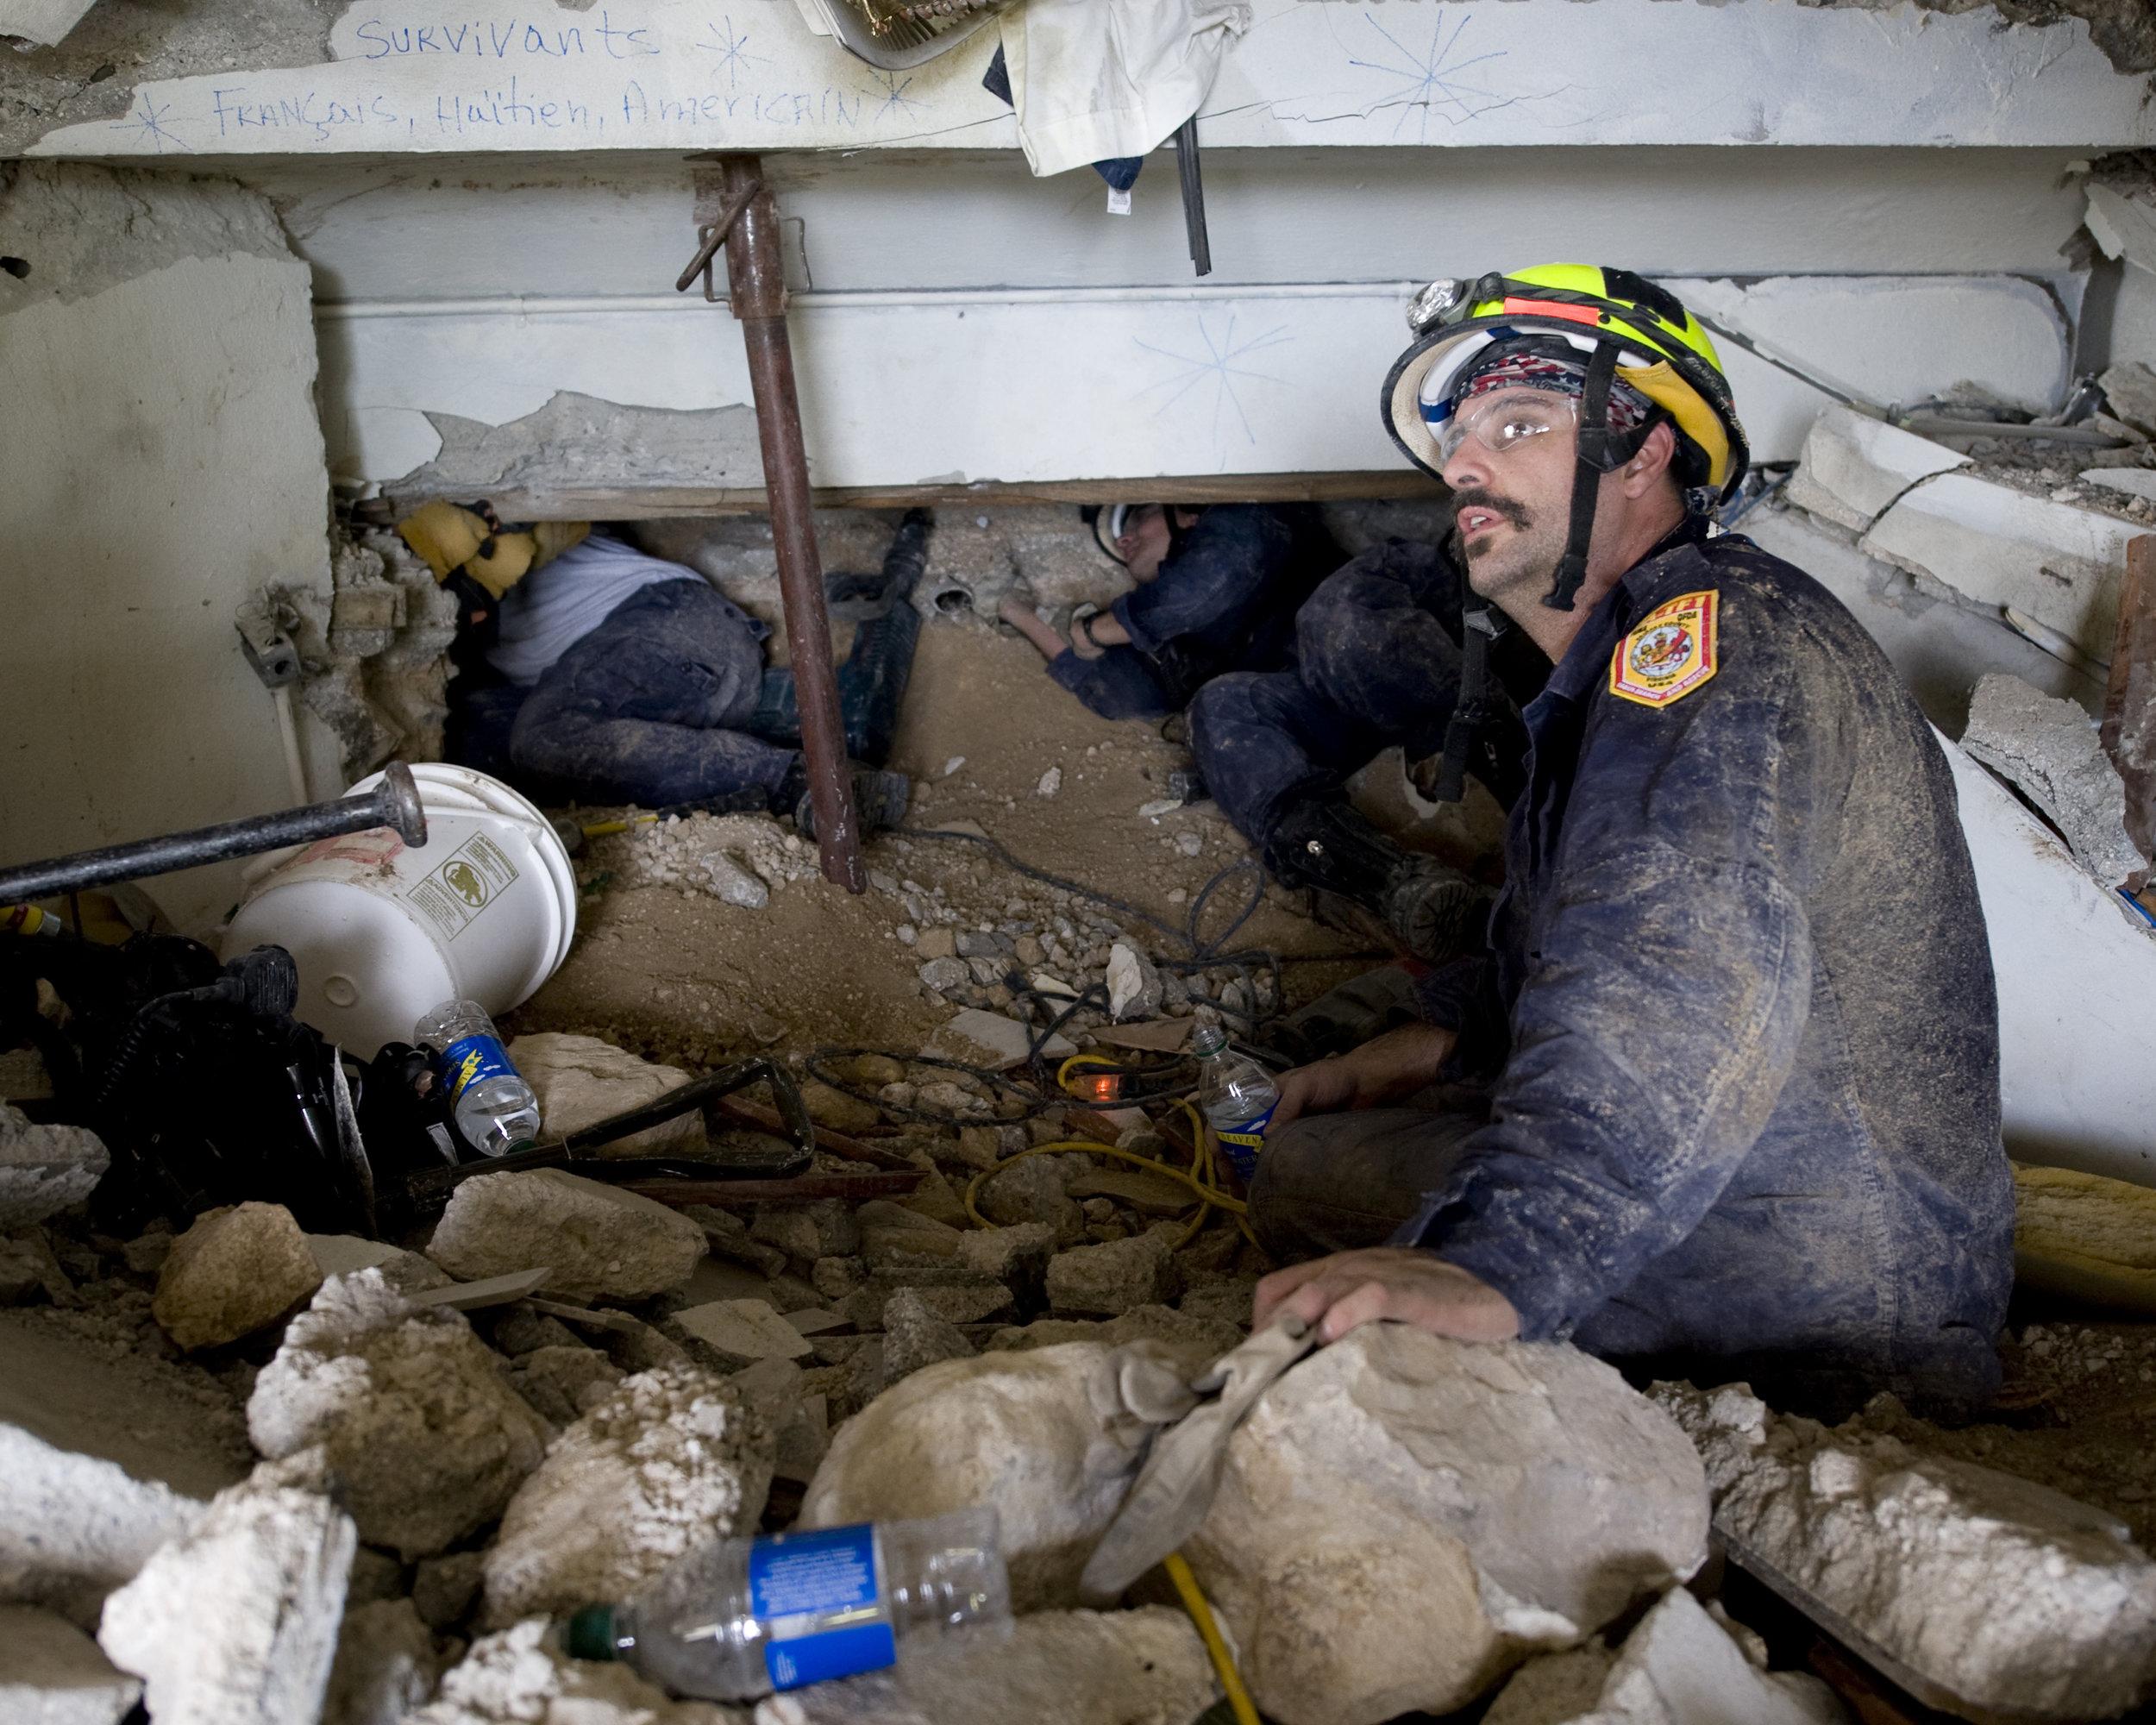 Fairfax_County_Urban_SAR_conducting_rescue_ops_inside_Montana_Hotel_2010-01-14.jpg